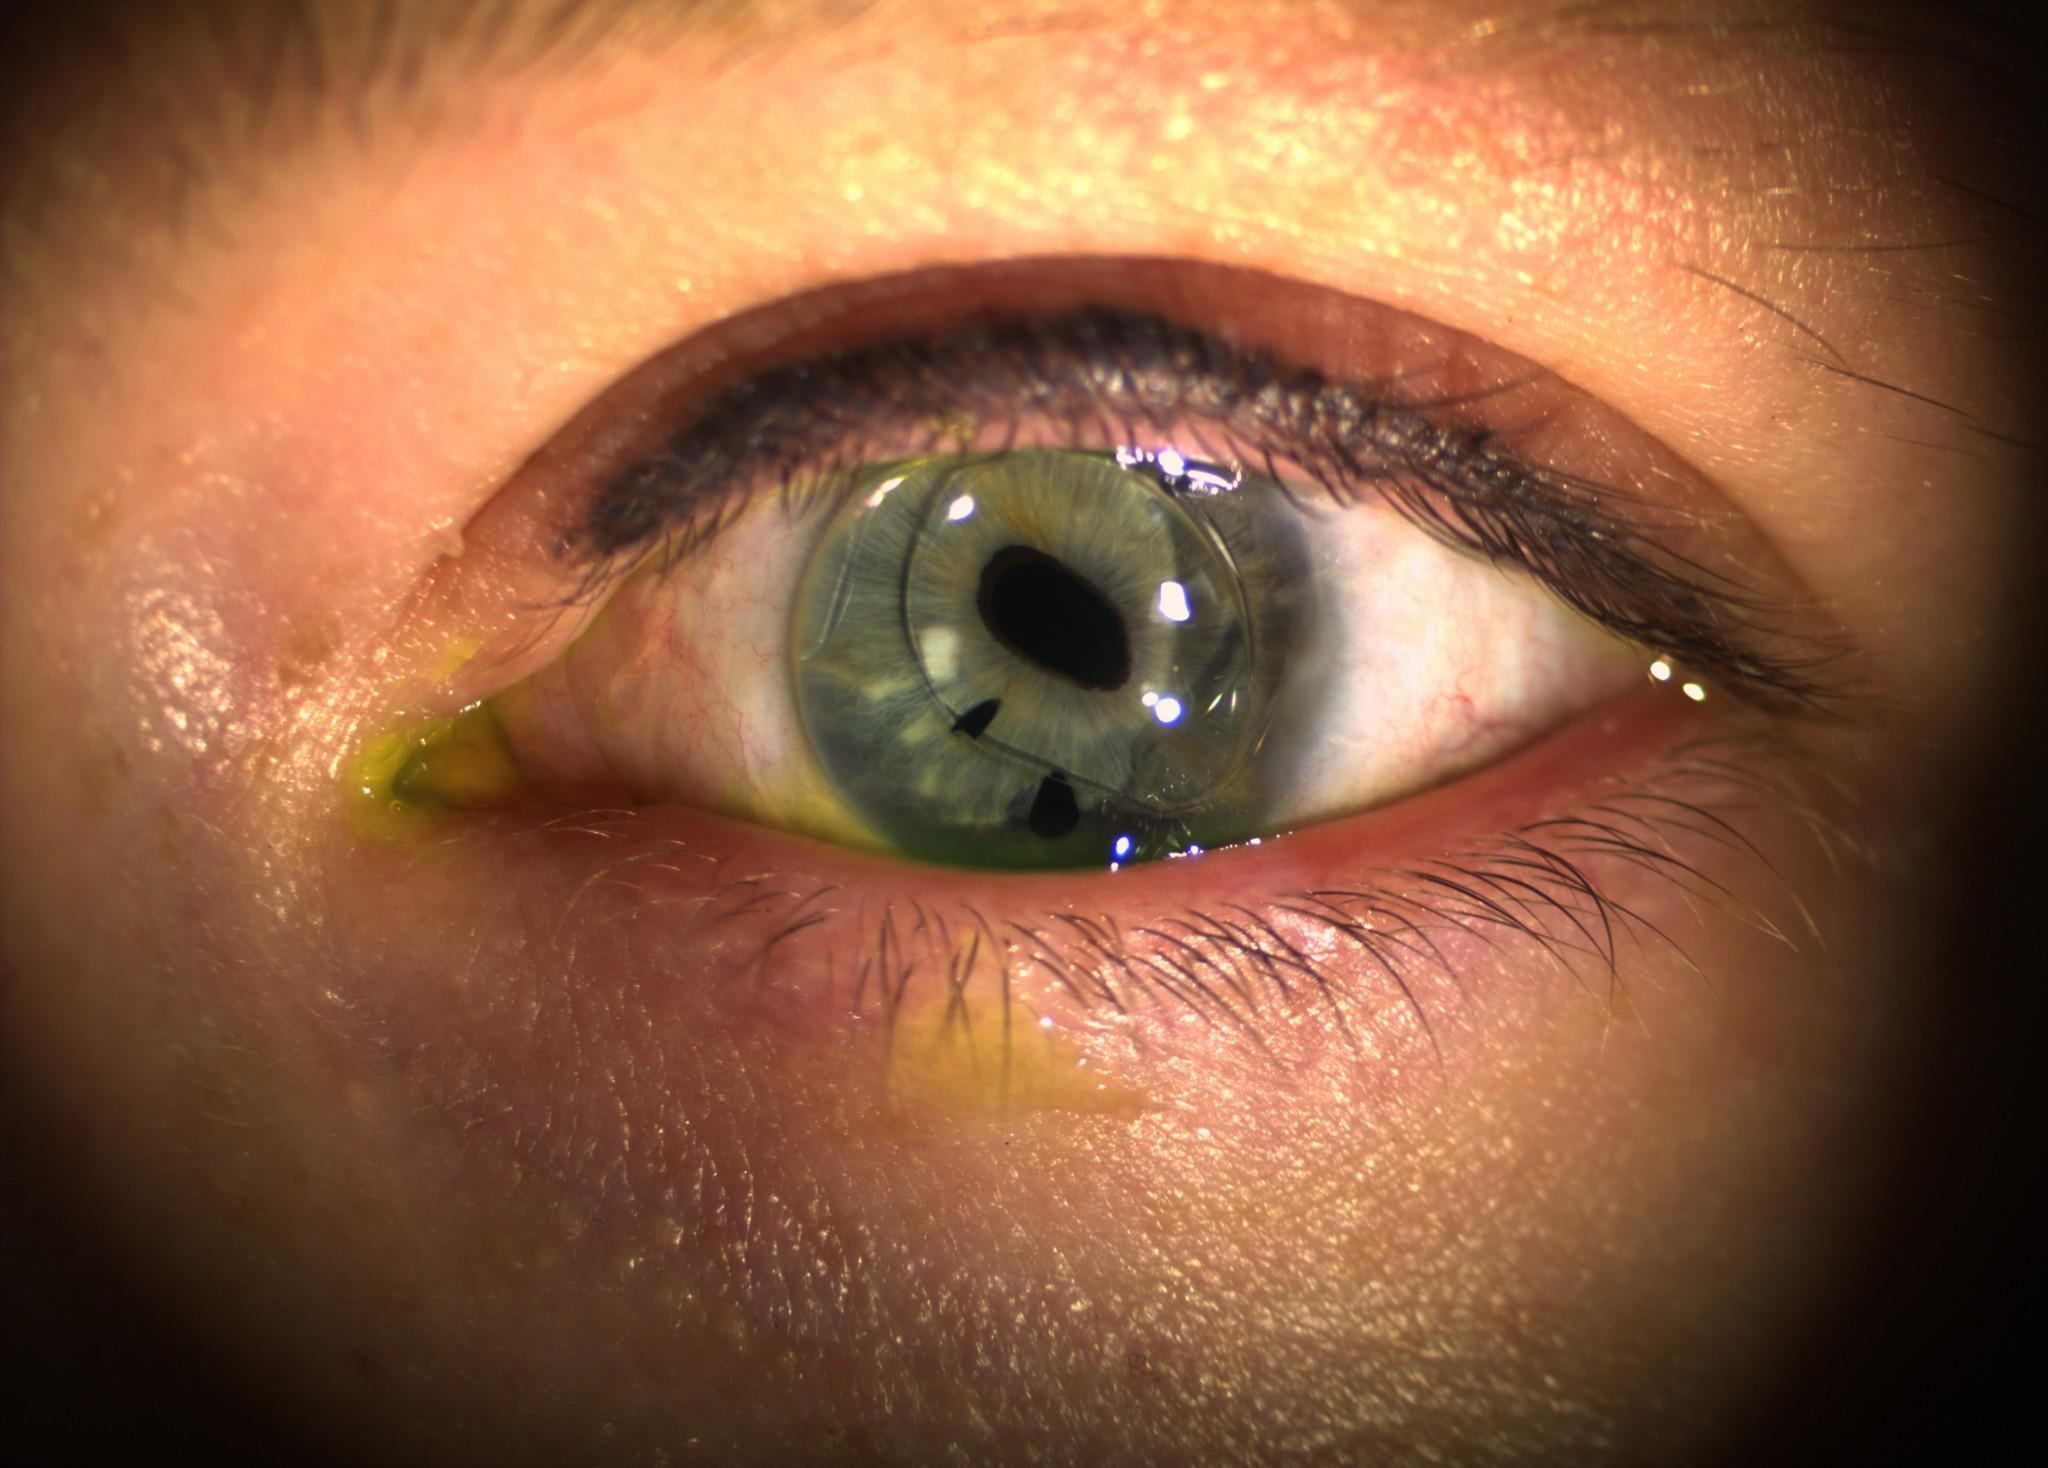 EyeSpace Bespoke Bitoric lens fitted over anterior intraocular lens on the left eye.